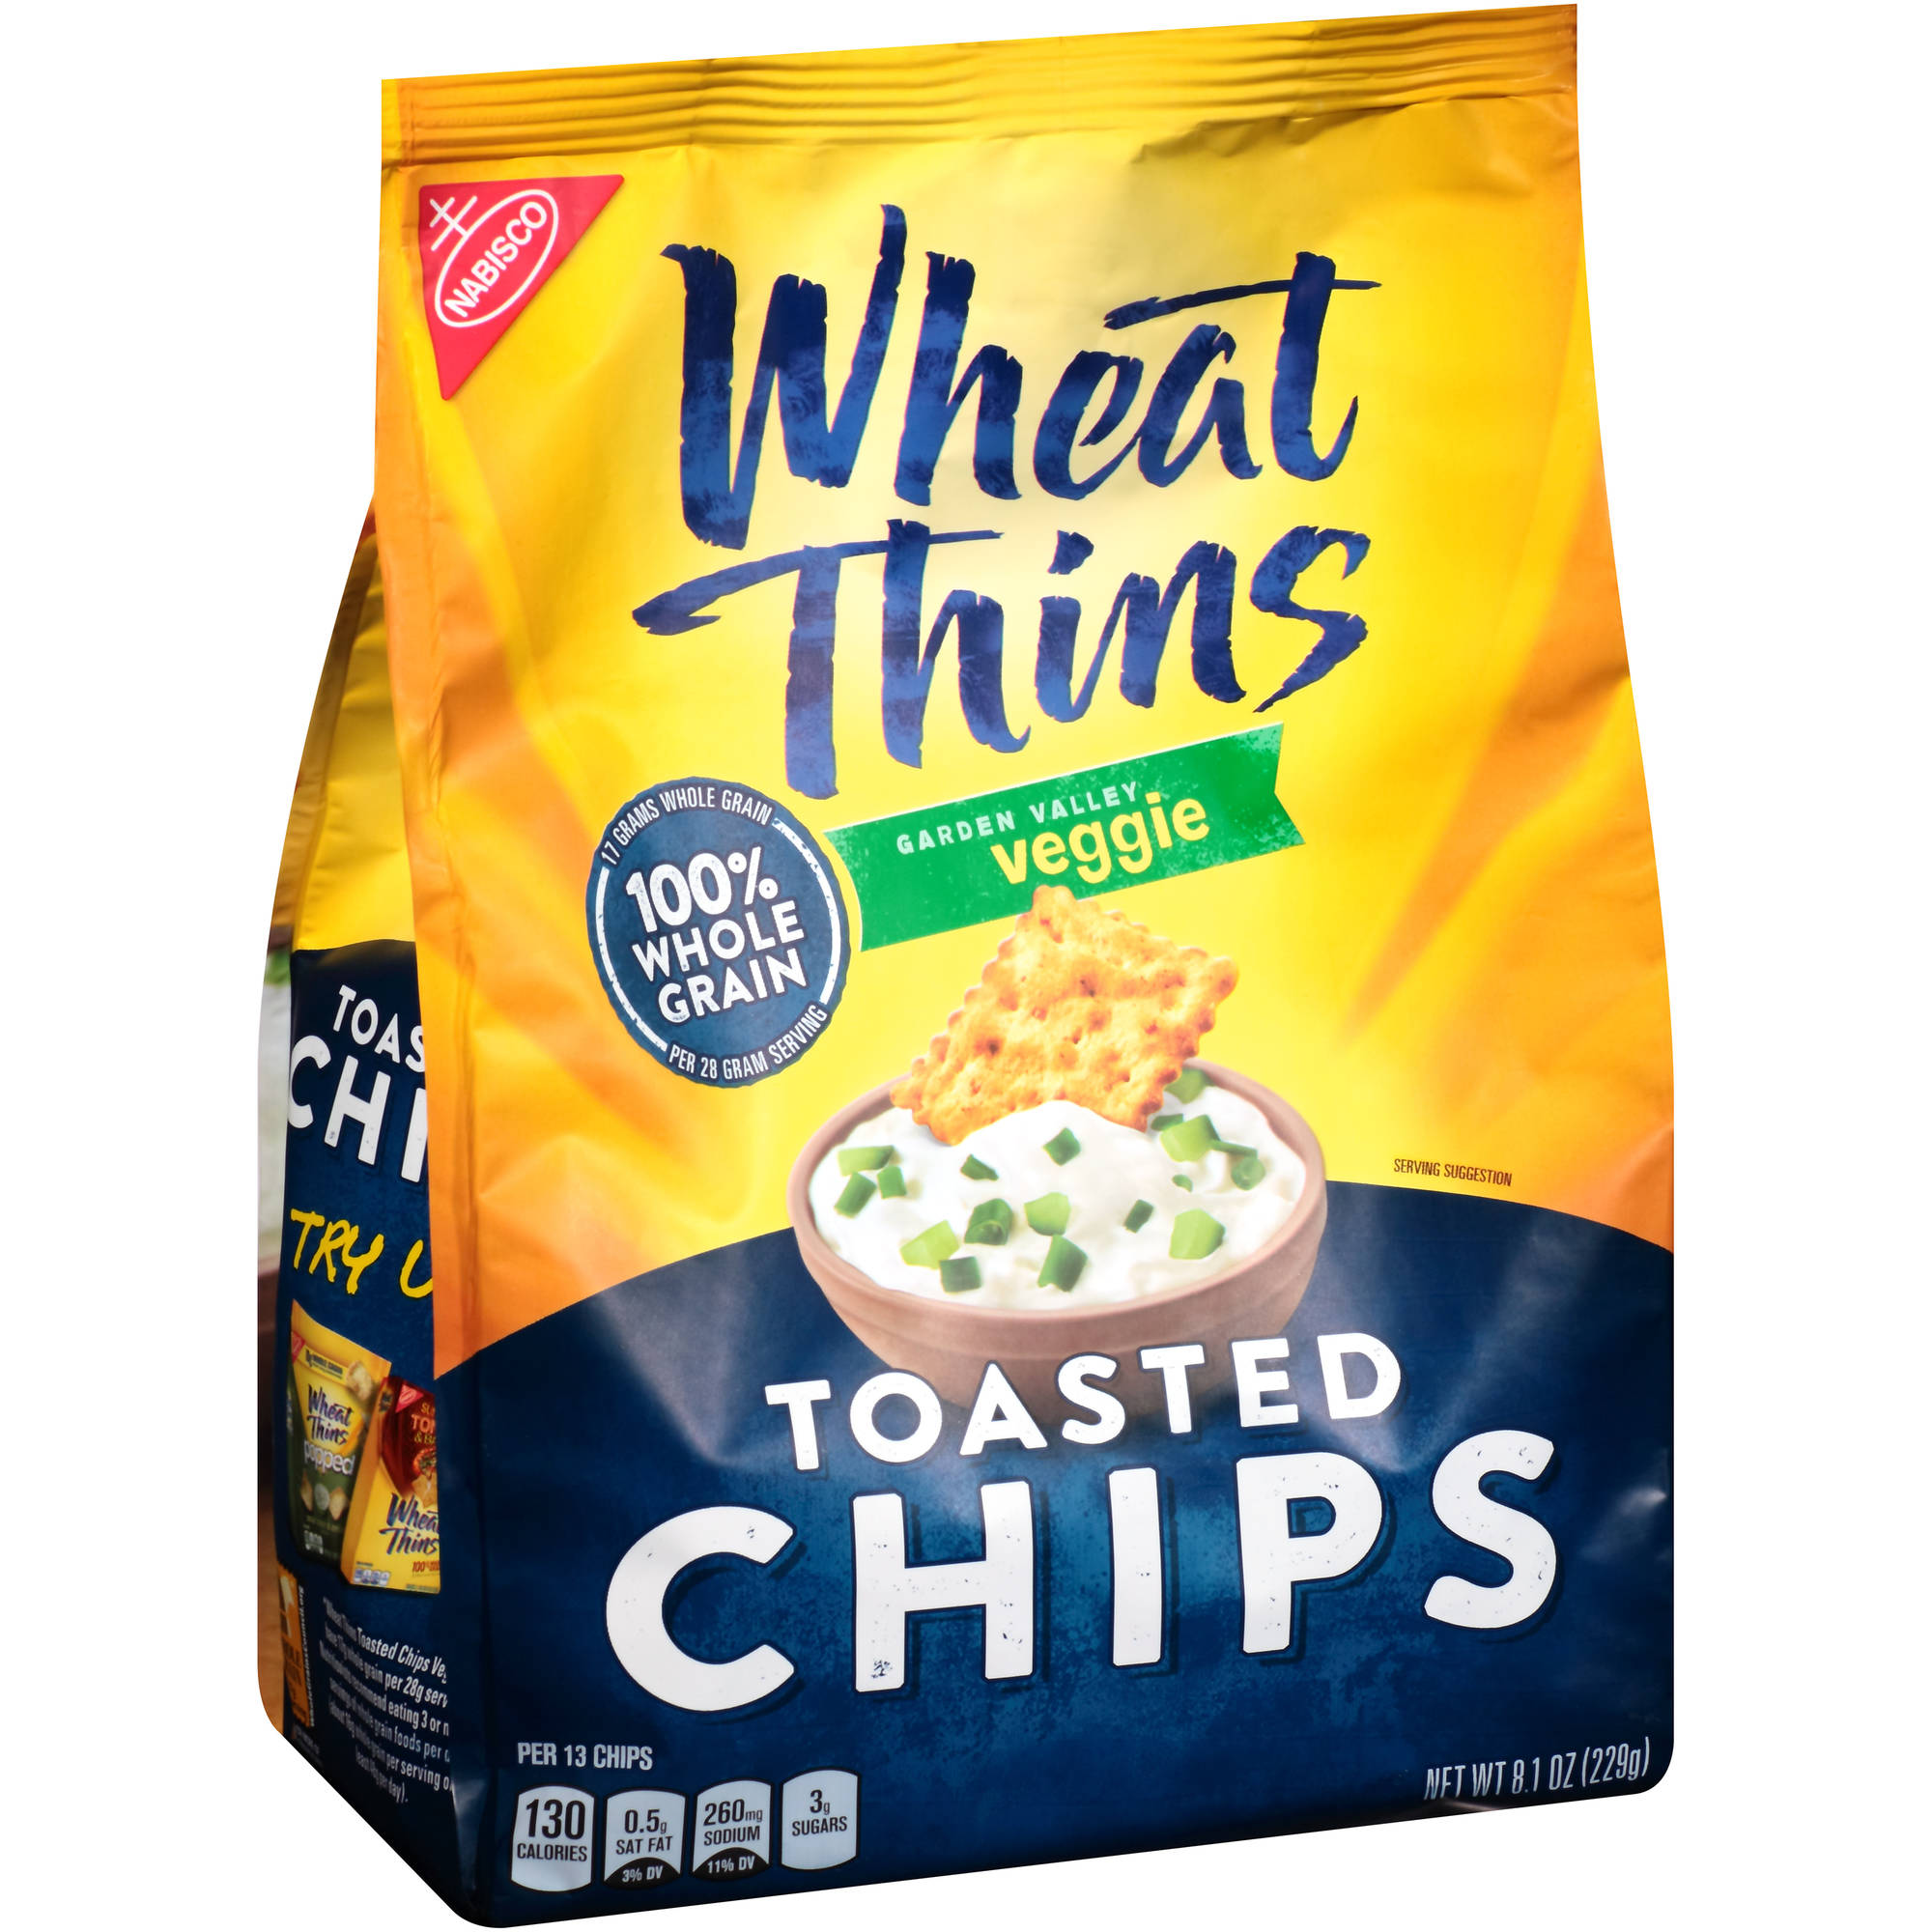 Nabisco Wheat Thins Garden Valley Veggie Toasted Chips, 8.1 oz